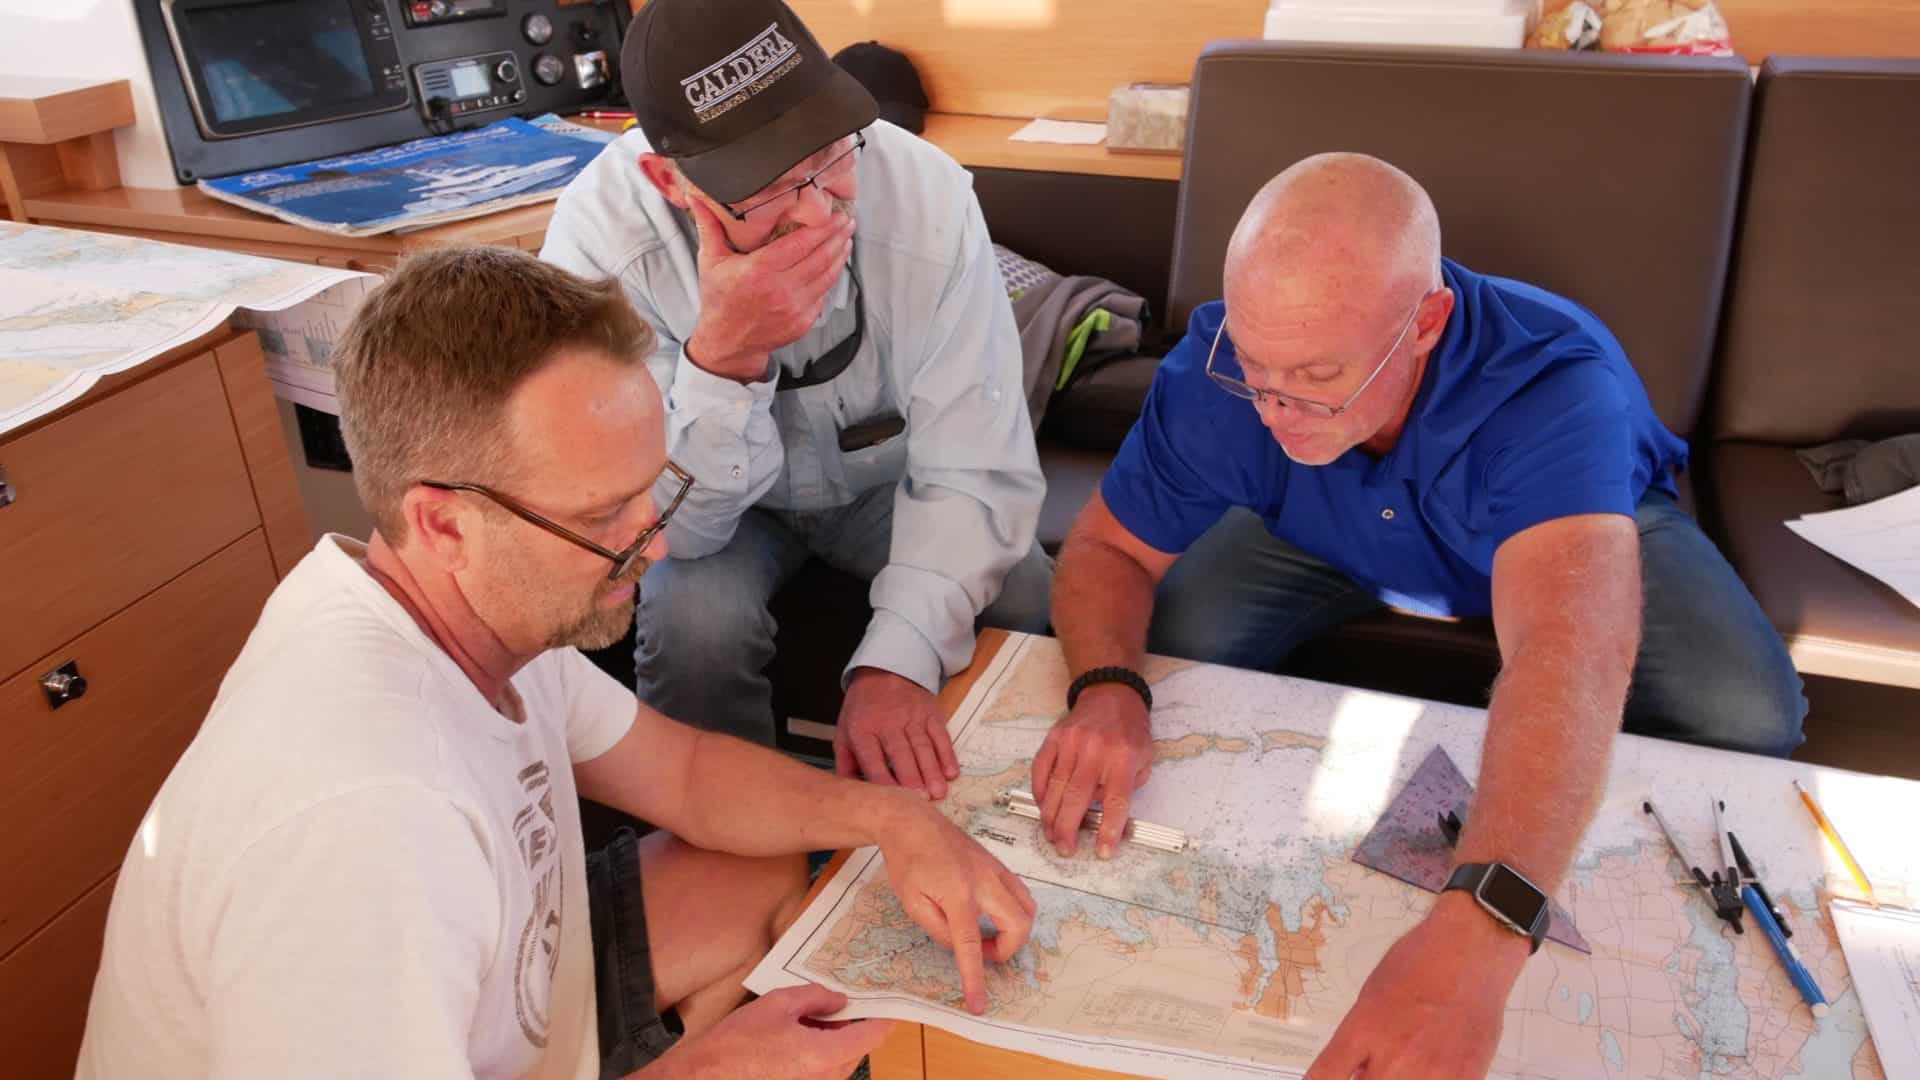 Matt, Tim Capt. Chas working on Coastal Navigation